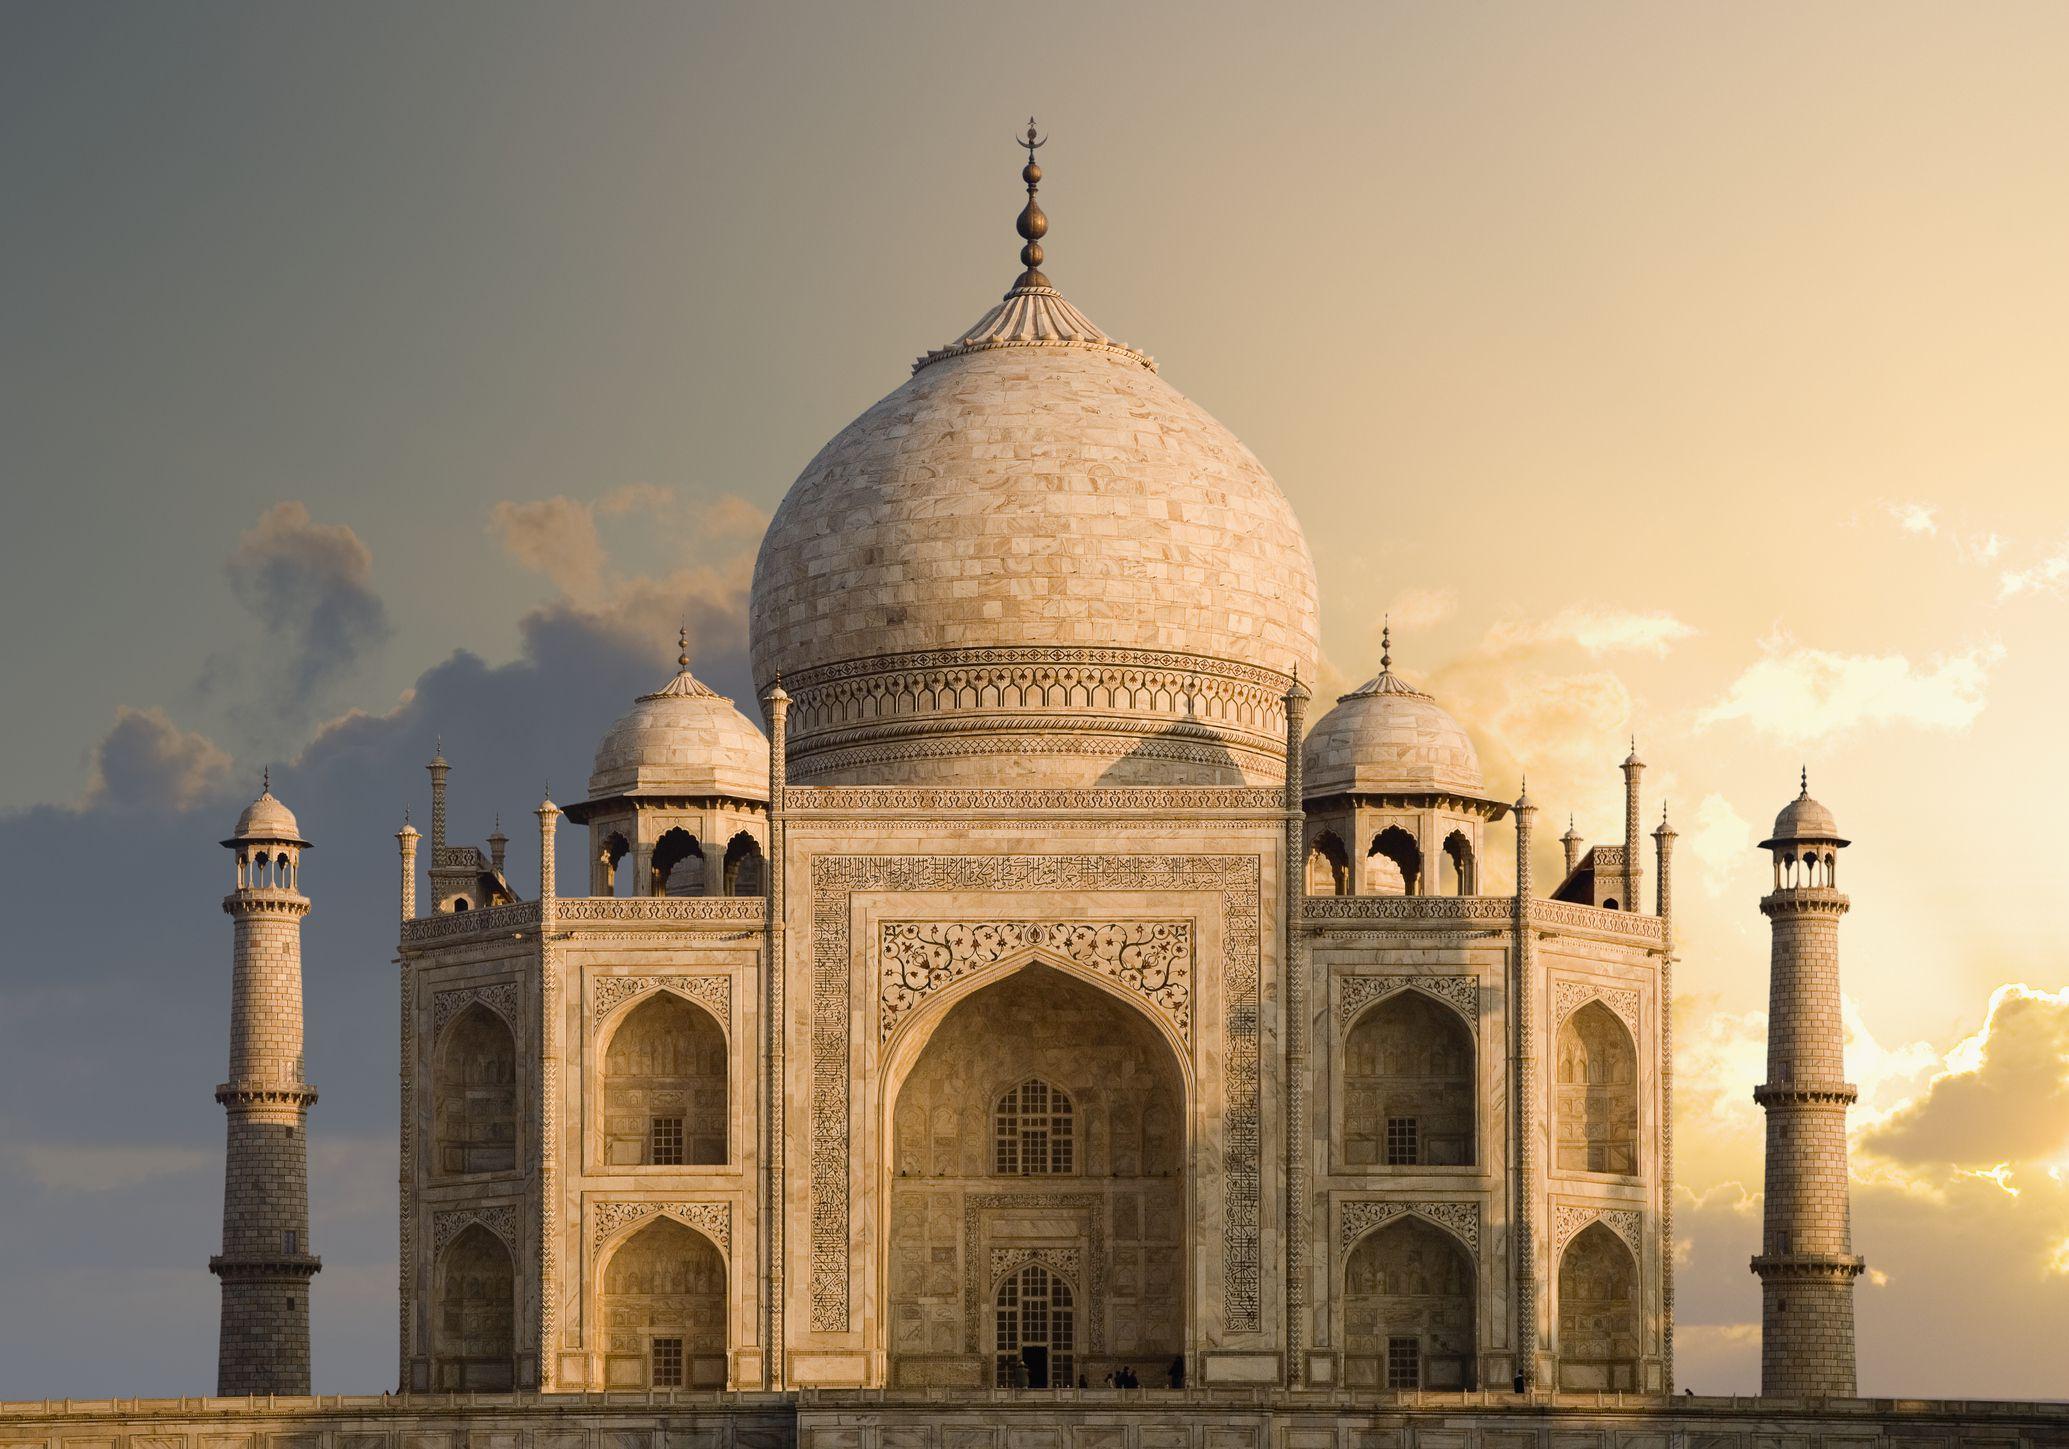 Best Trains For Travel Between Delhi And Agra Taj Mahal